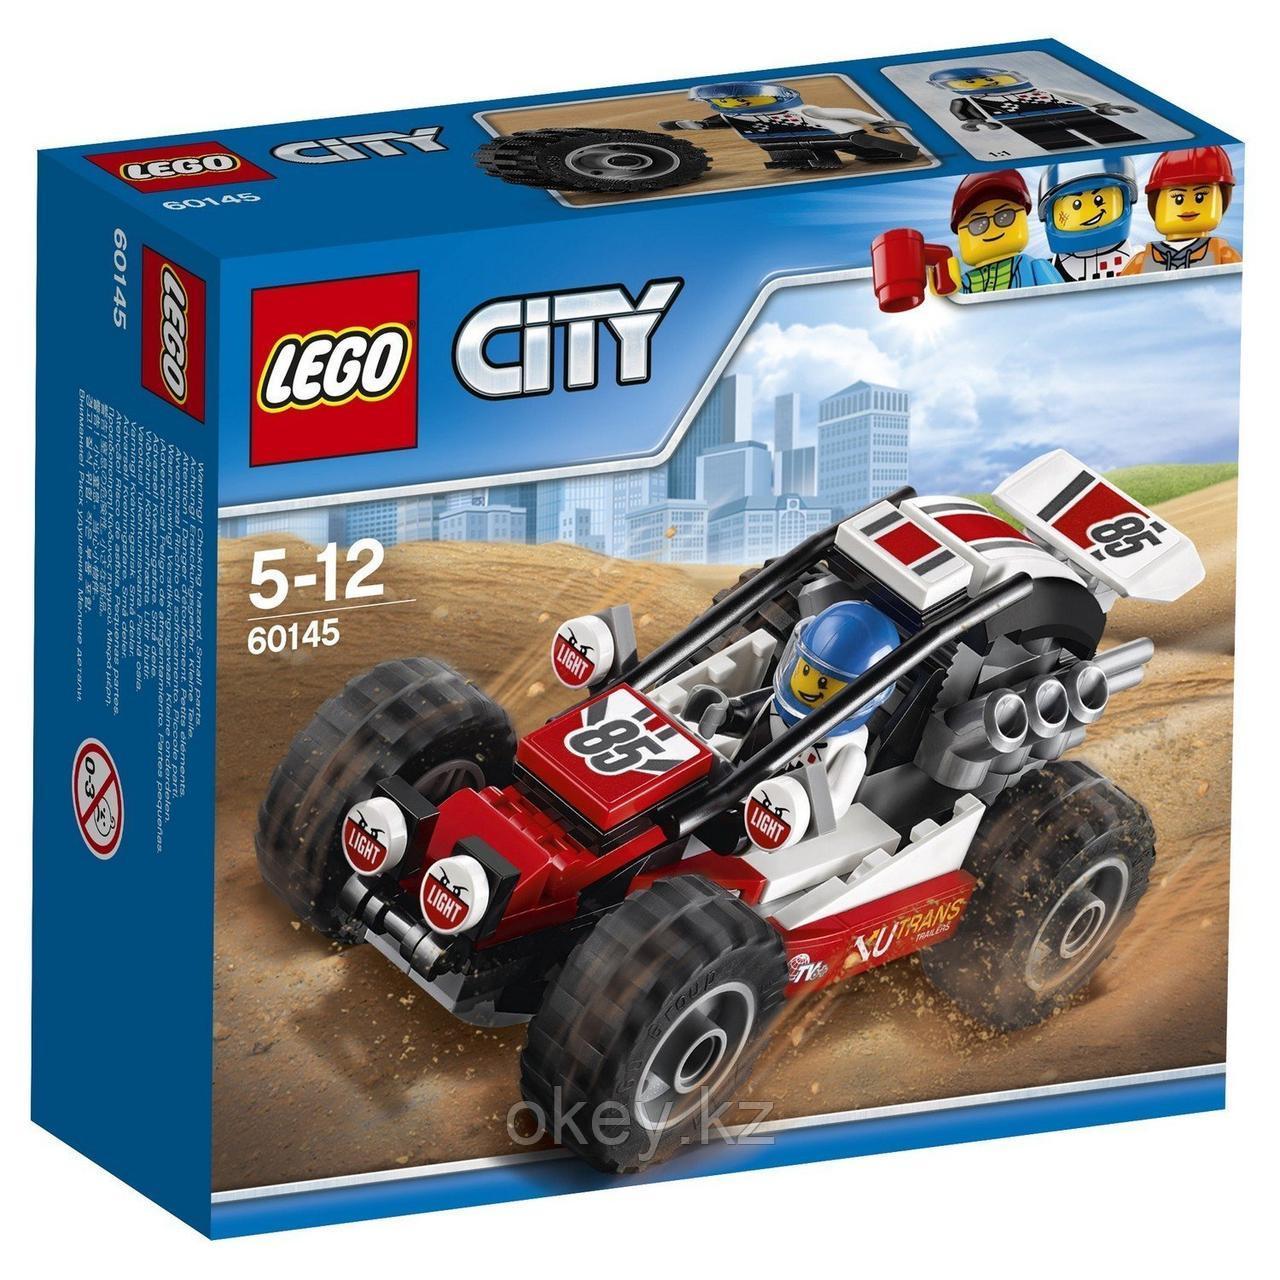 LEGO City: Багги 60145